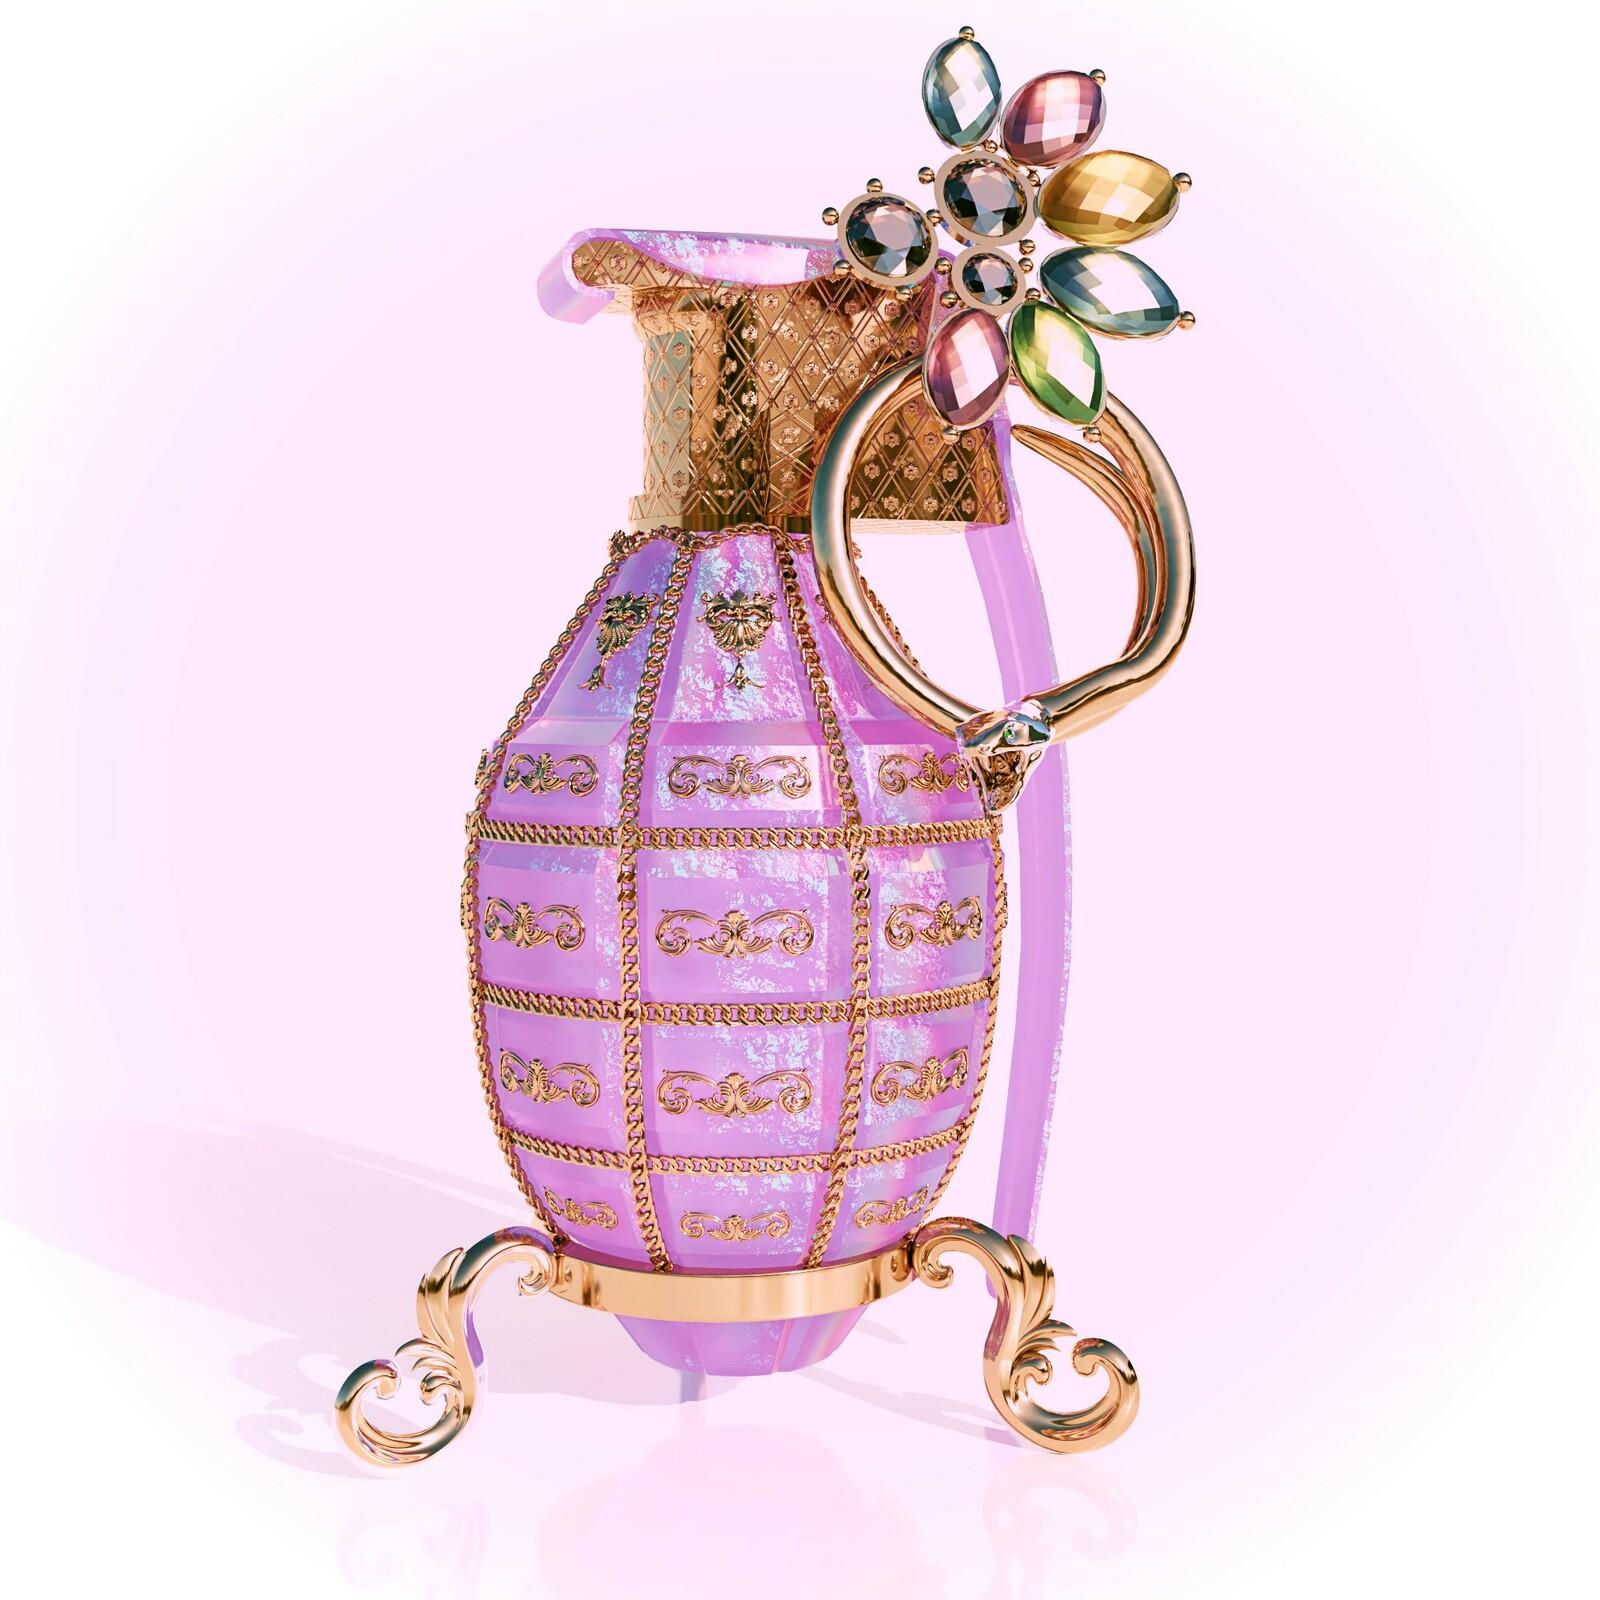 Pyrobolus Convenusto - Pink opal